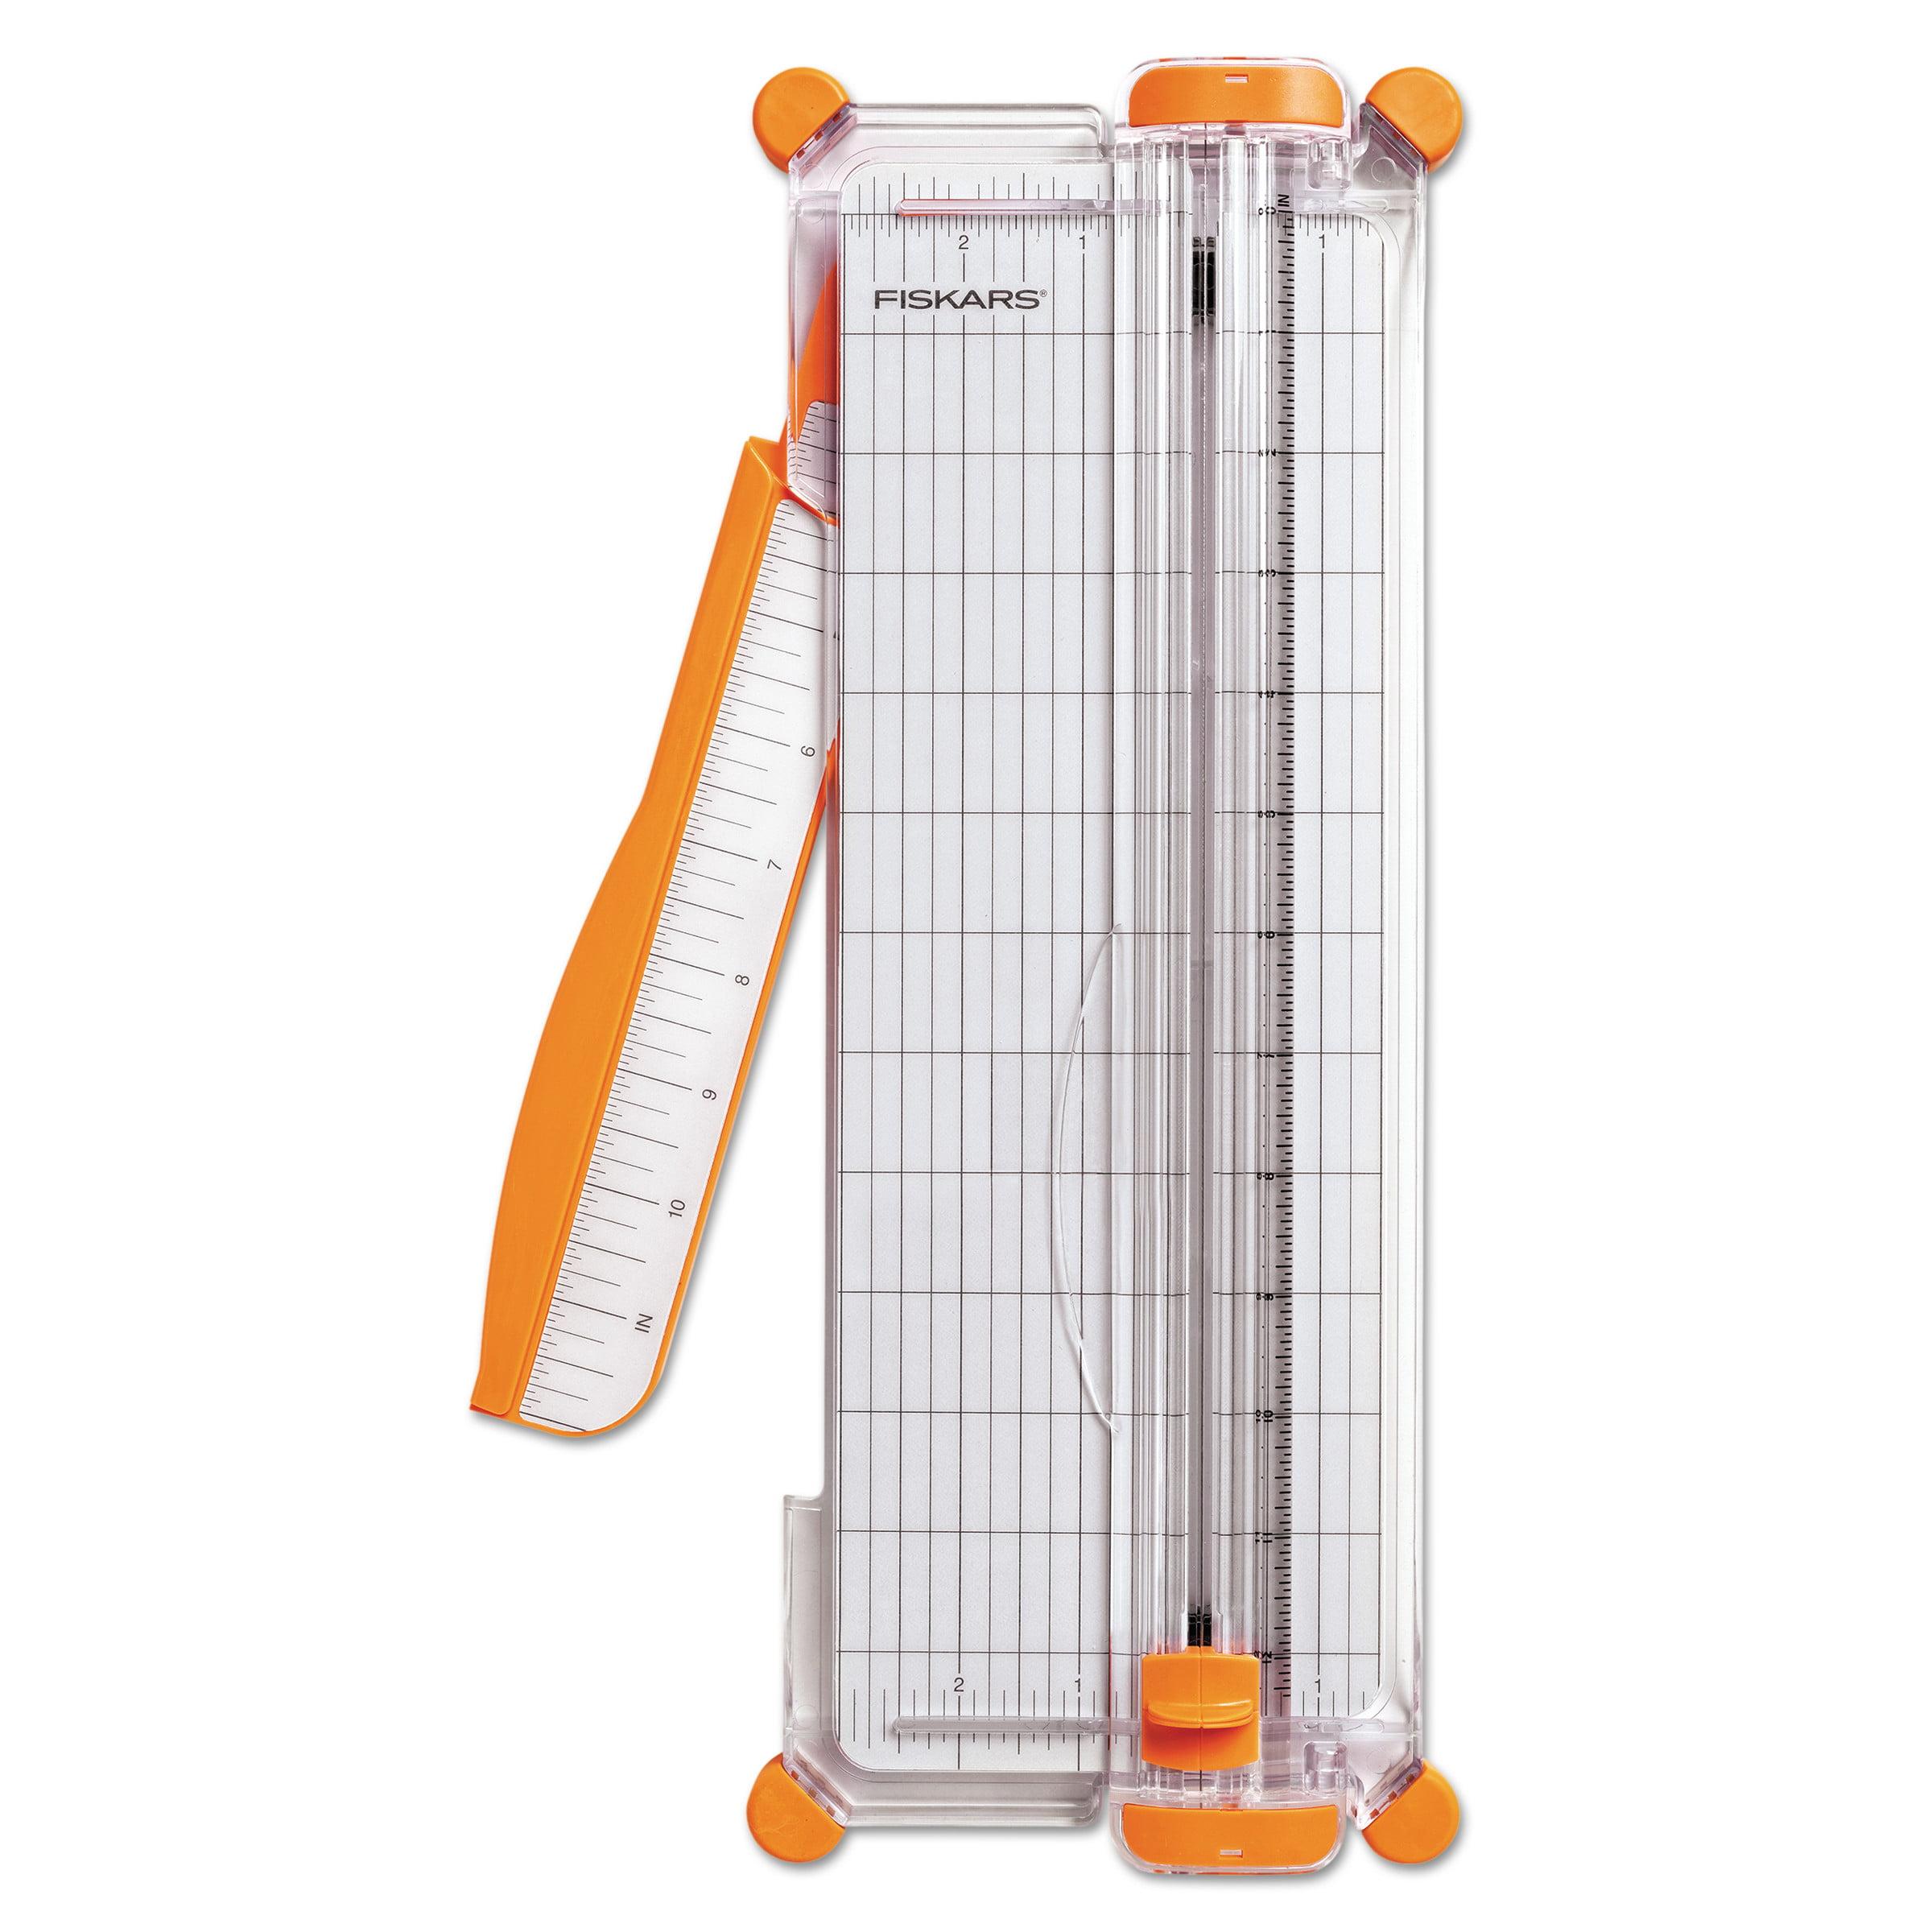 "Fiskars Personal Paper Trimmer, 5 Sheets, 12"" Cut Length -FSK1775501001"